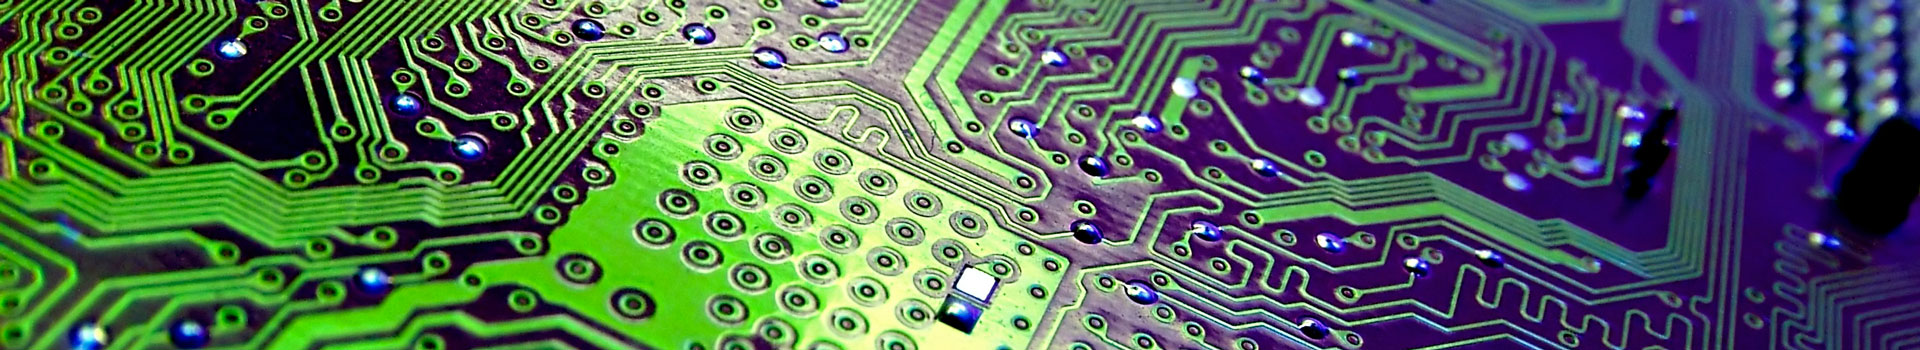 Elektronik_Steuerung_Mechatronik